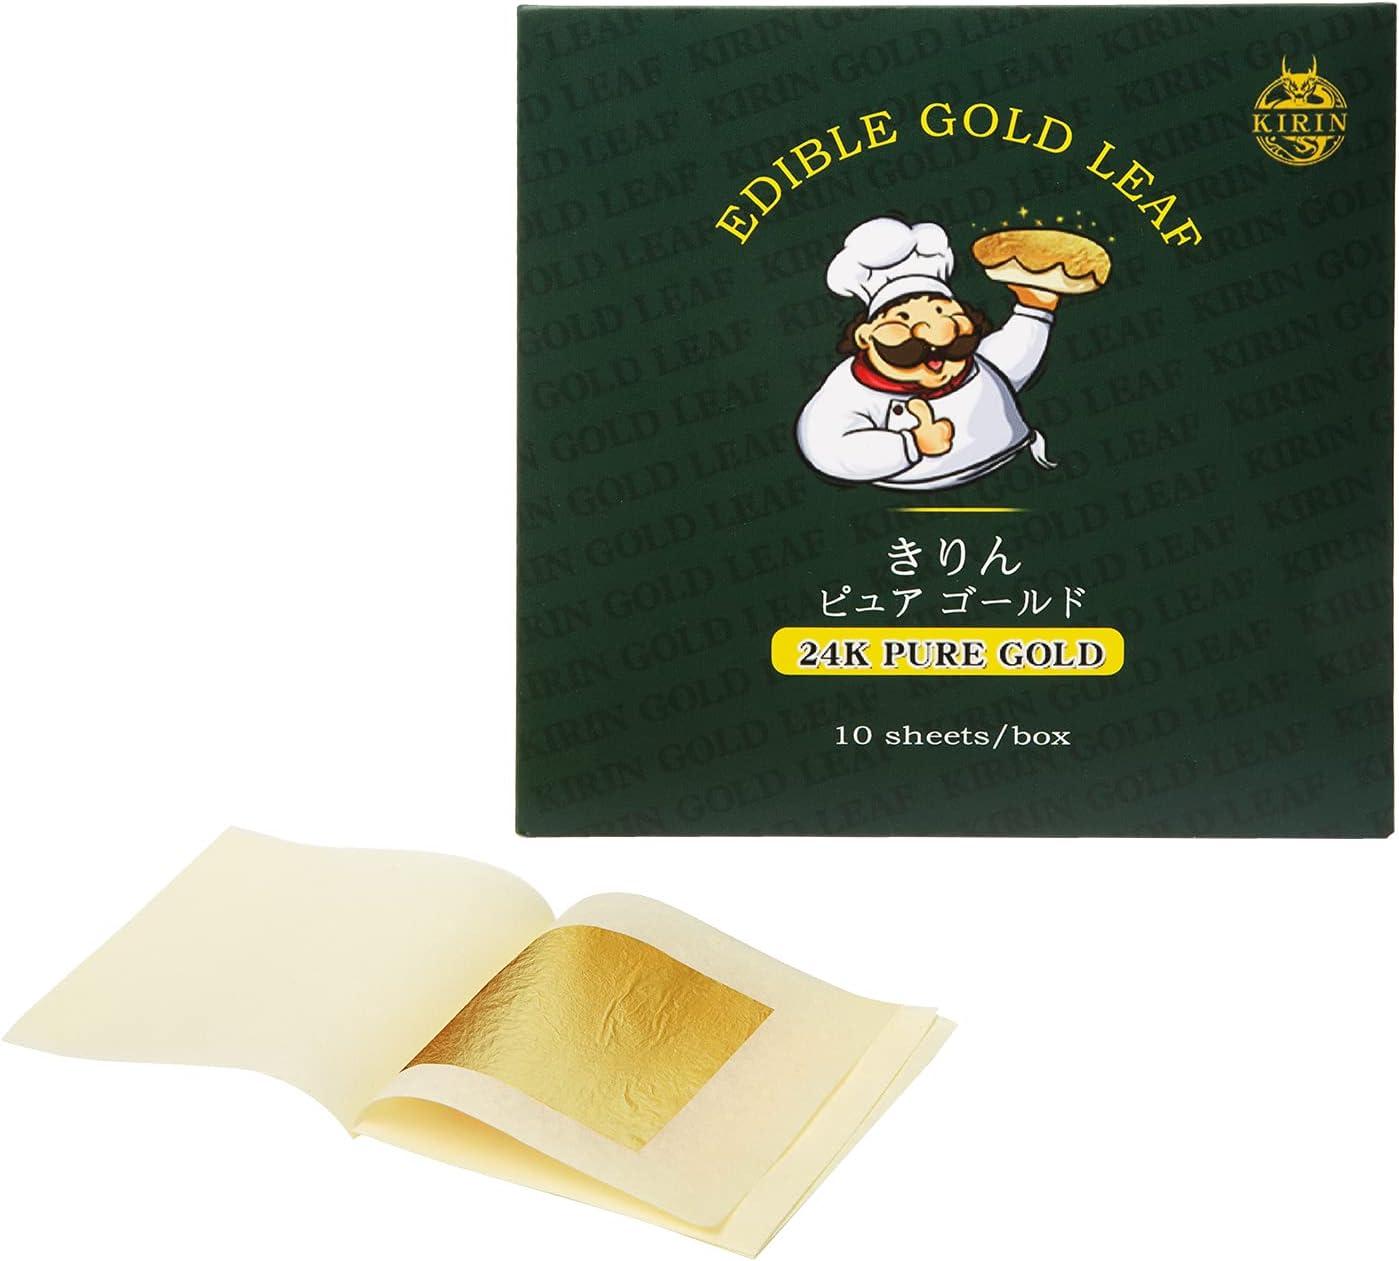 24K Edible Gold Leaf Sheets 10 Sheets 1.7